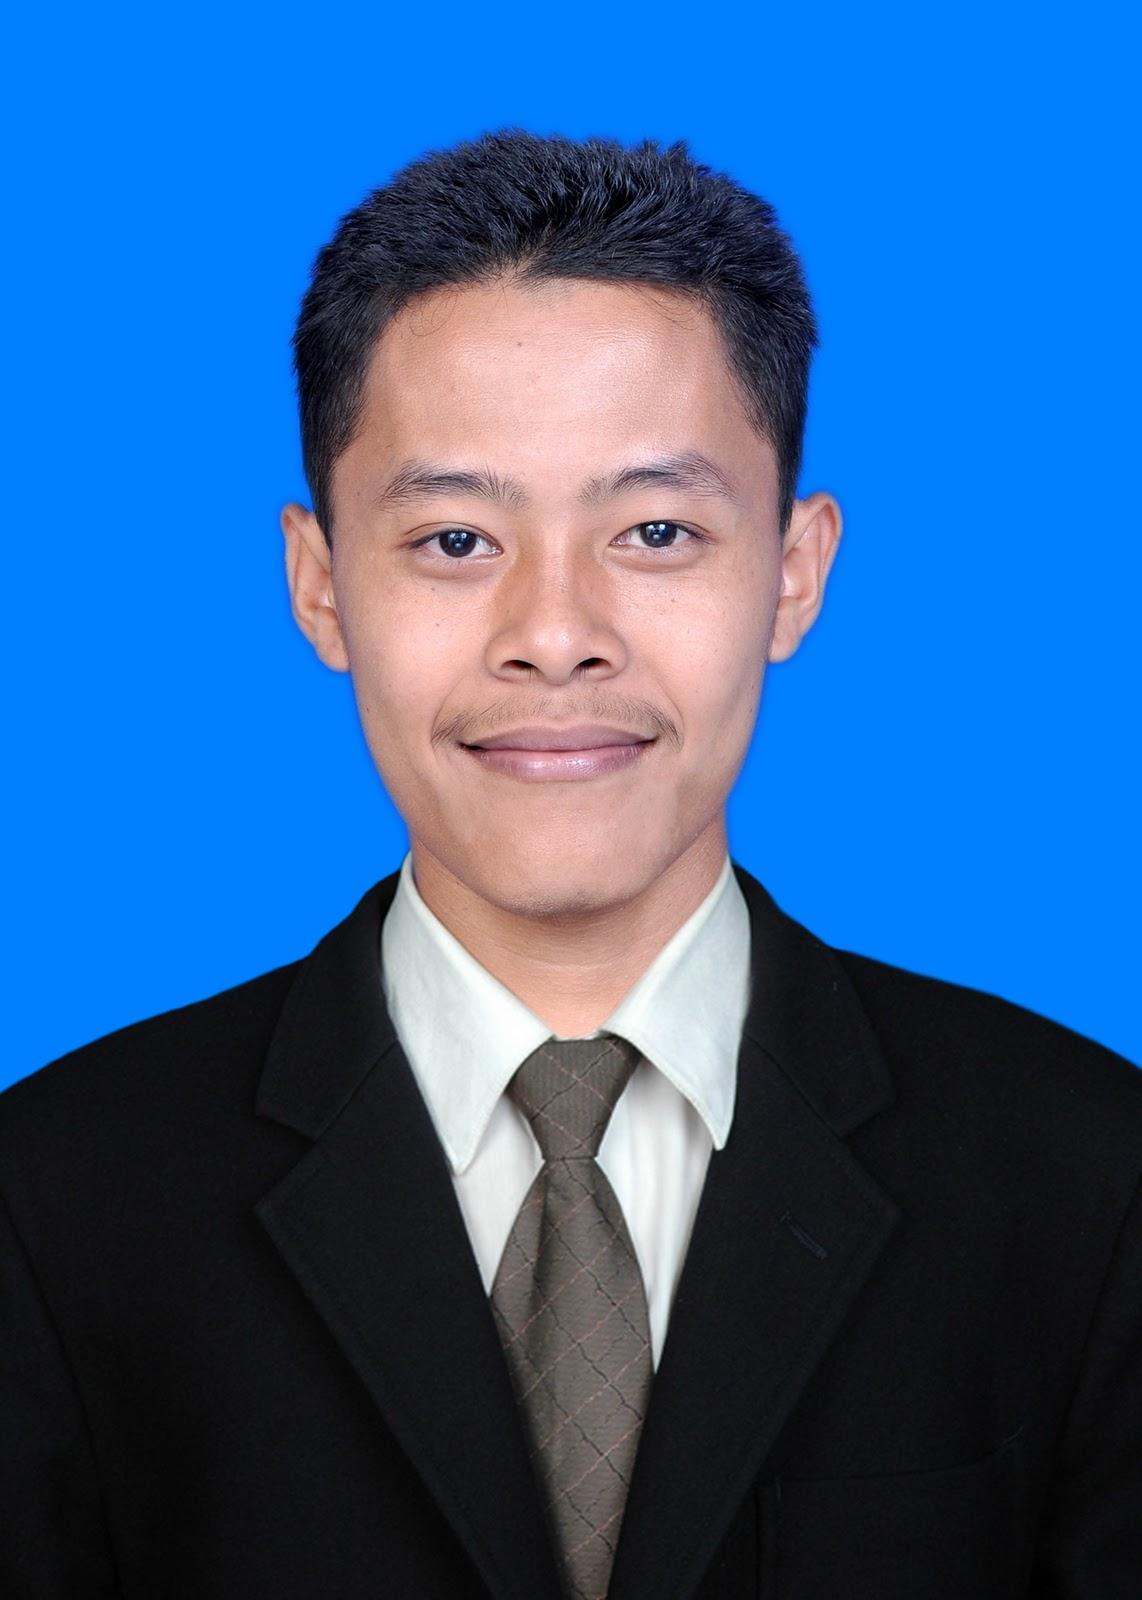 Contoh Karya Ilmiah Jurusan Manajemen - Contoh Bang